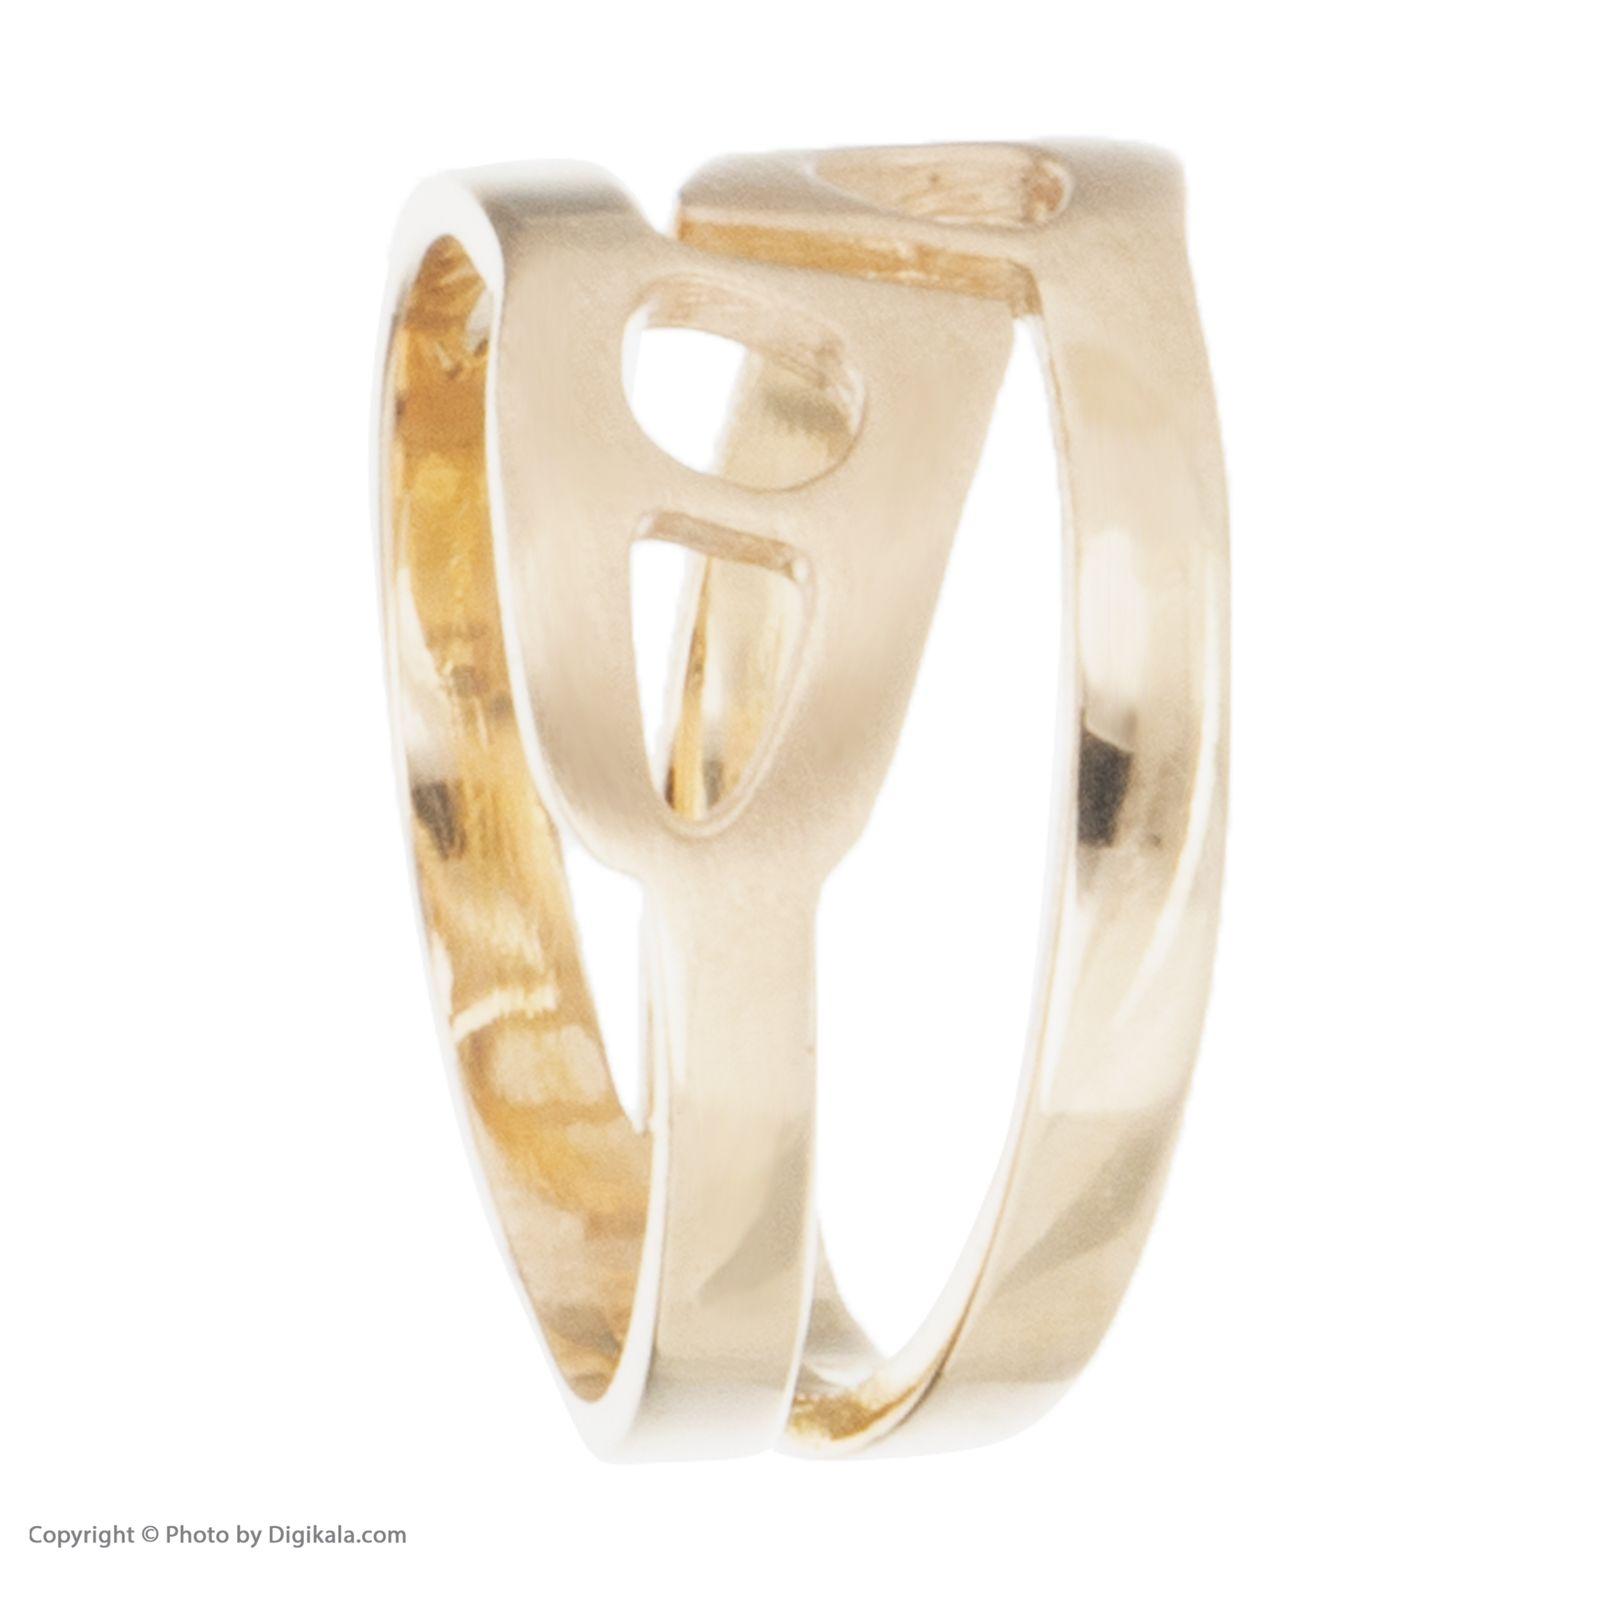 انگشتر طلا 18 عیار زنانه آلند کد H1022 -  - 3